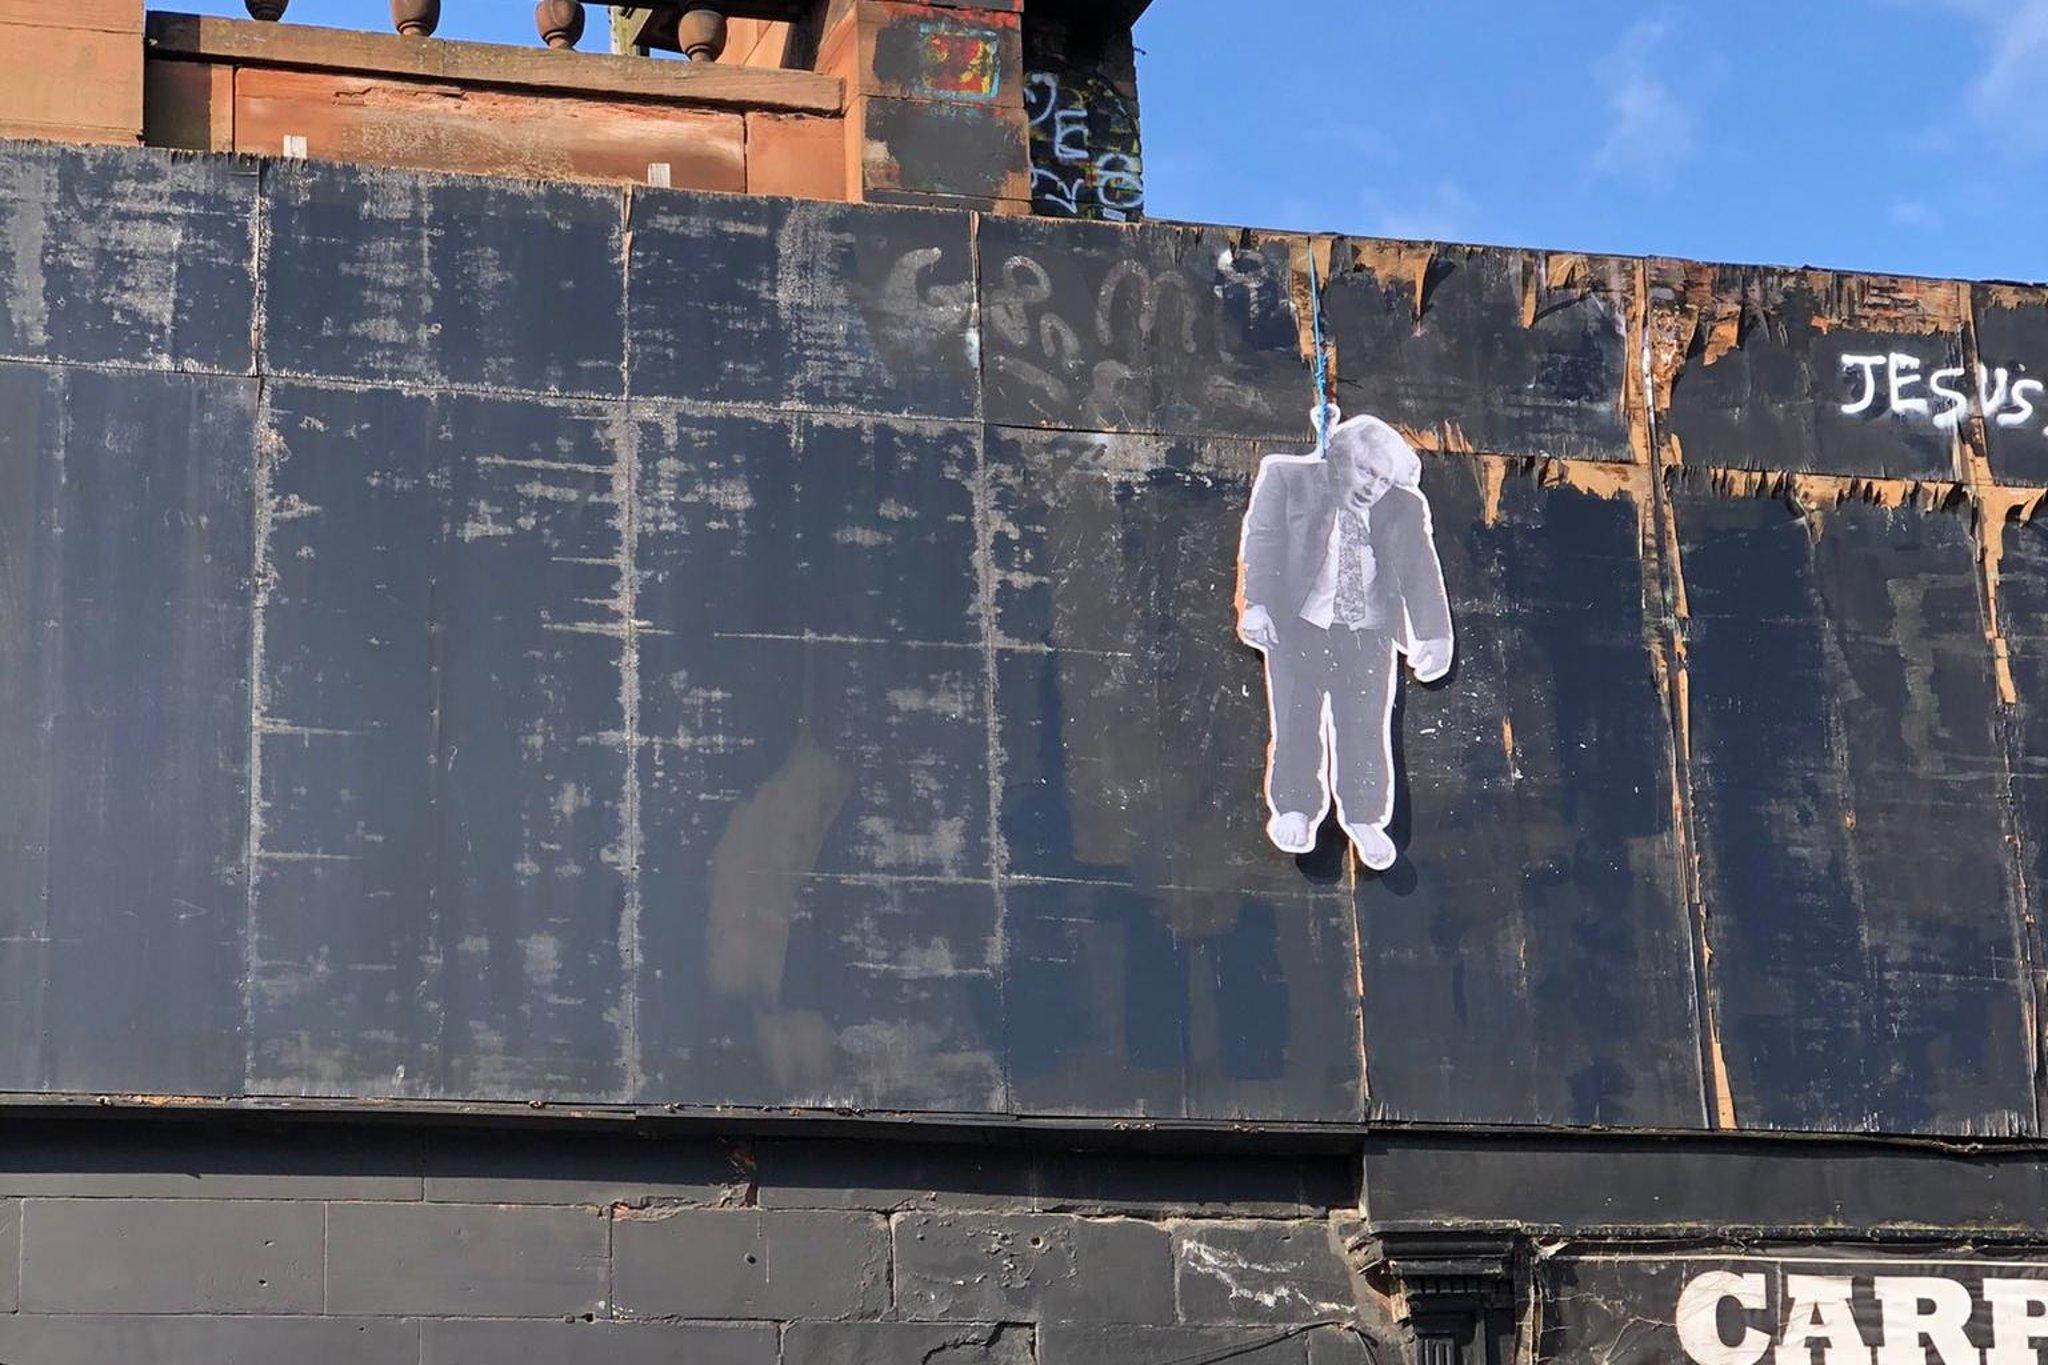 Edinburgh's council leader condemns 'unacceptable' Boris Johnson depiction on Leith Walk building